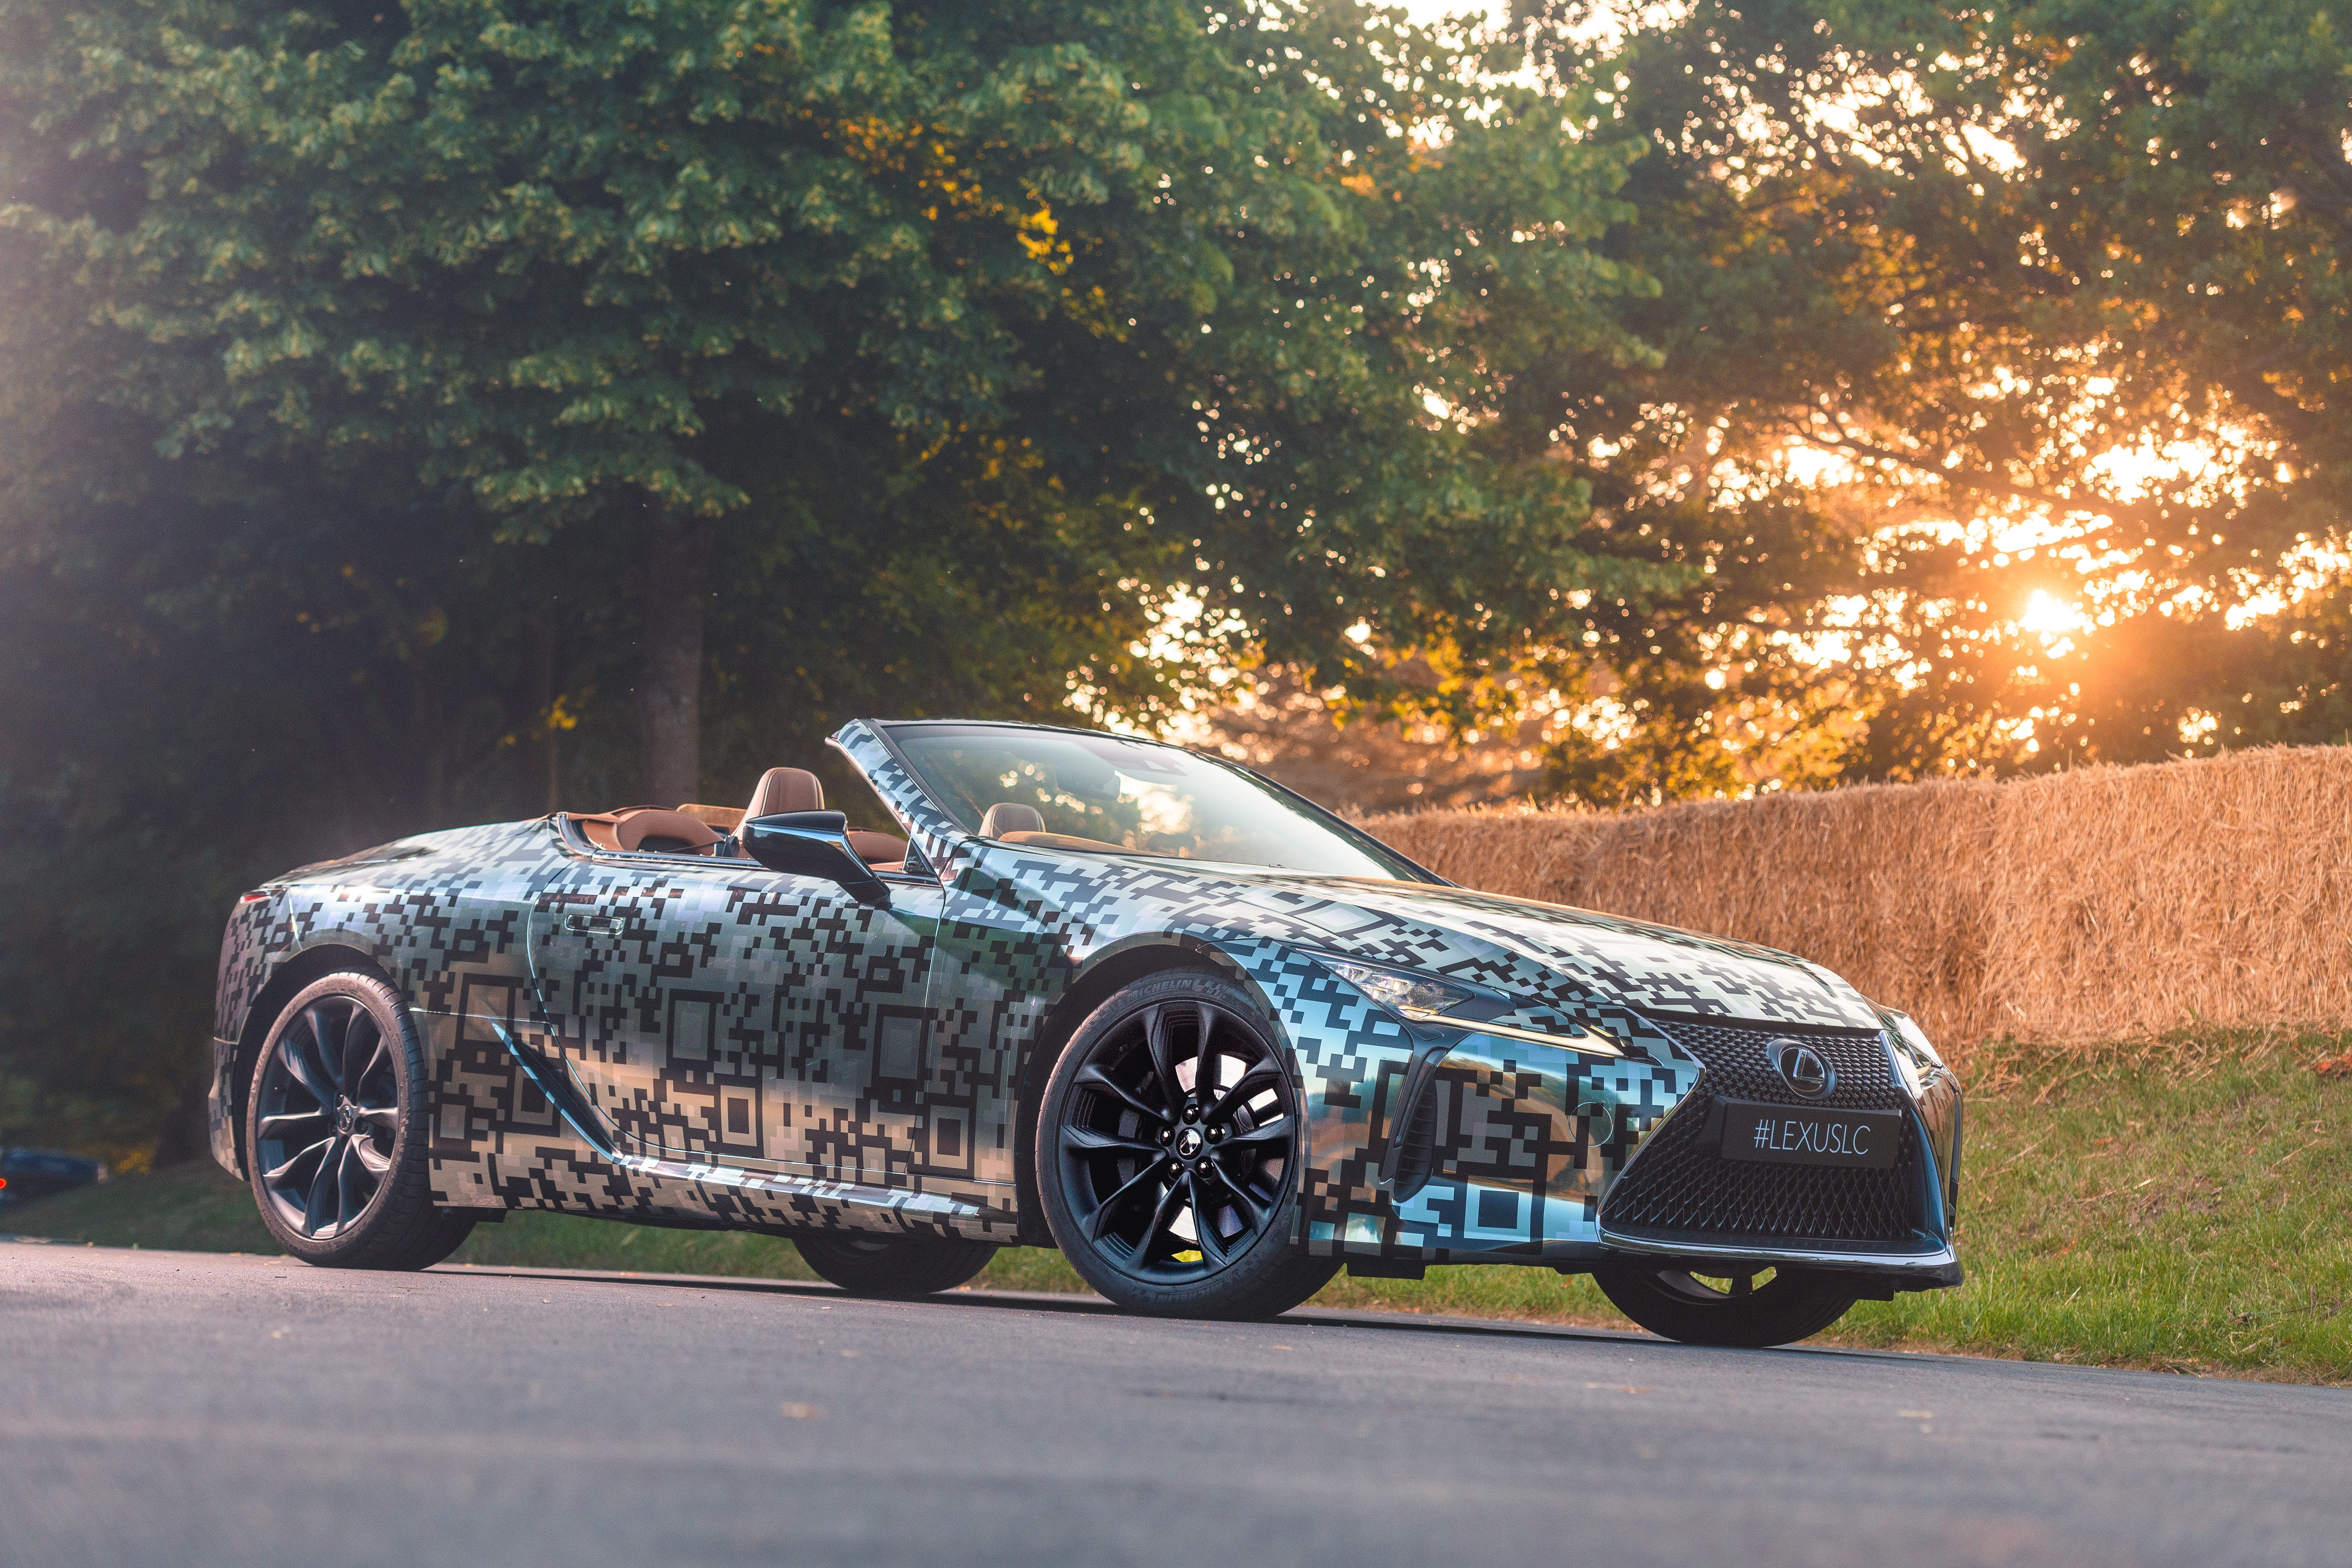 Toyota Luxury Brand Tests New Convertible Option